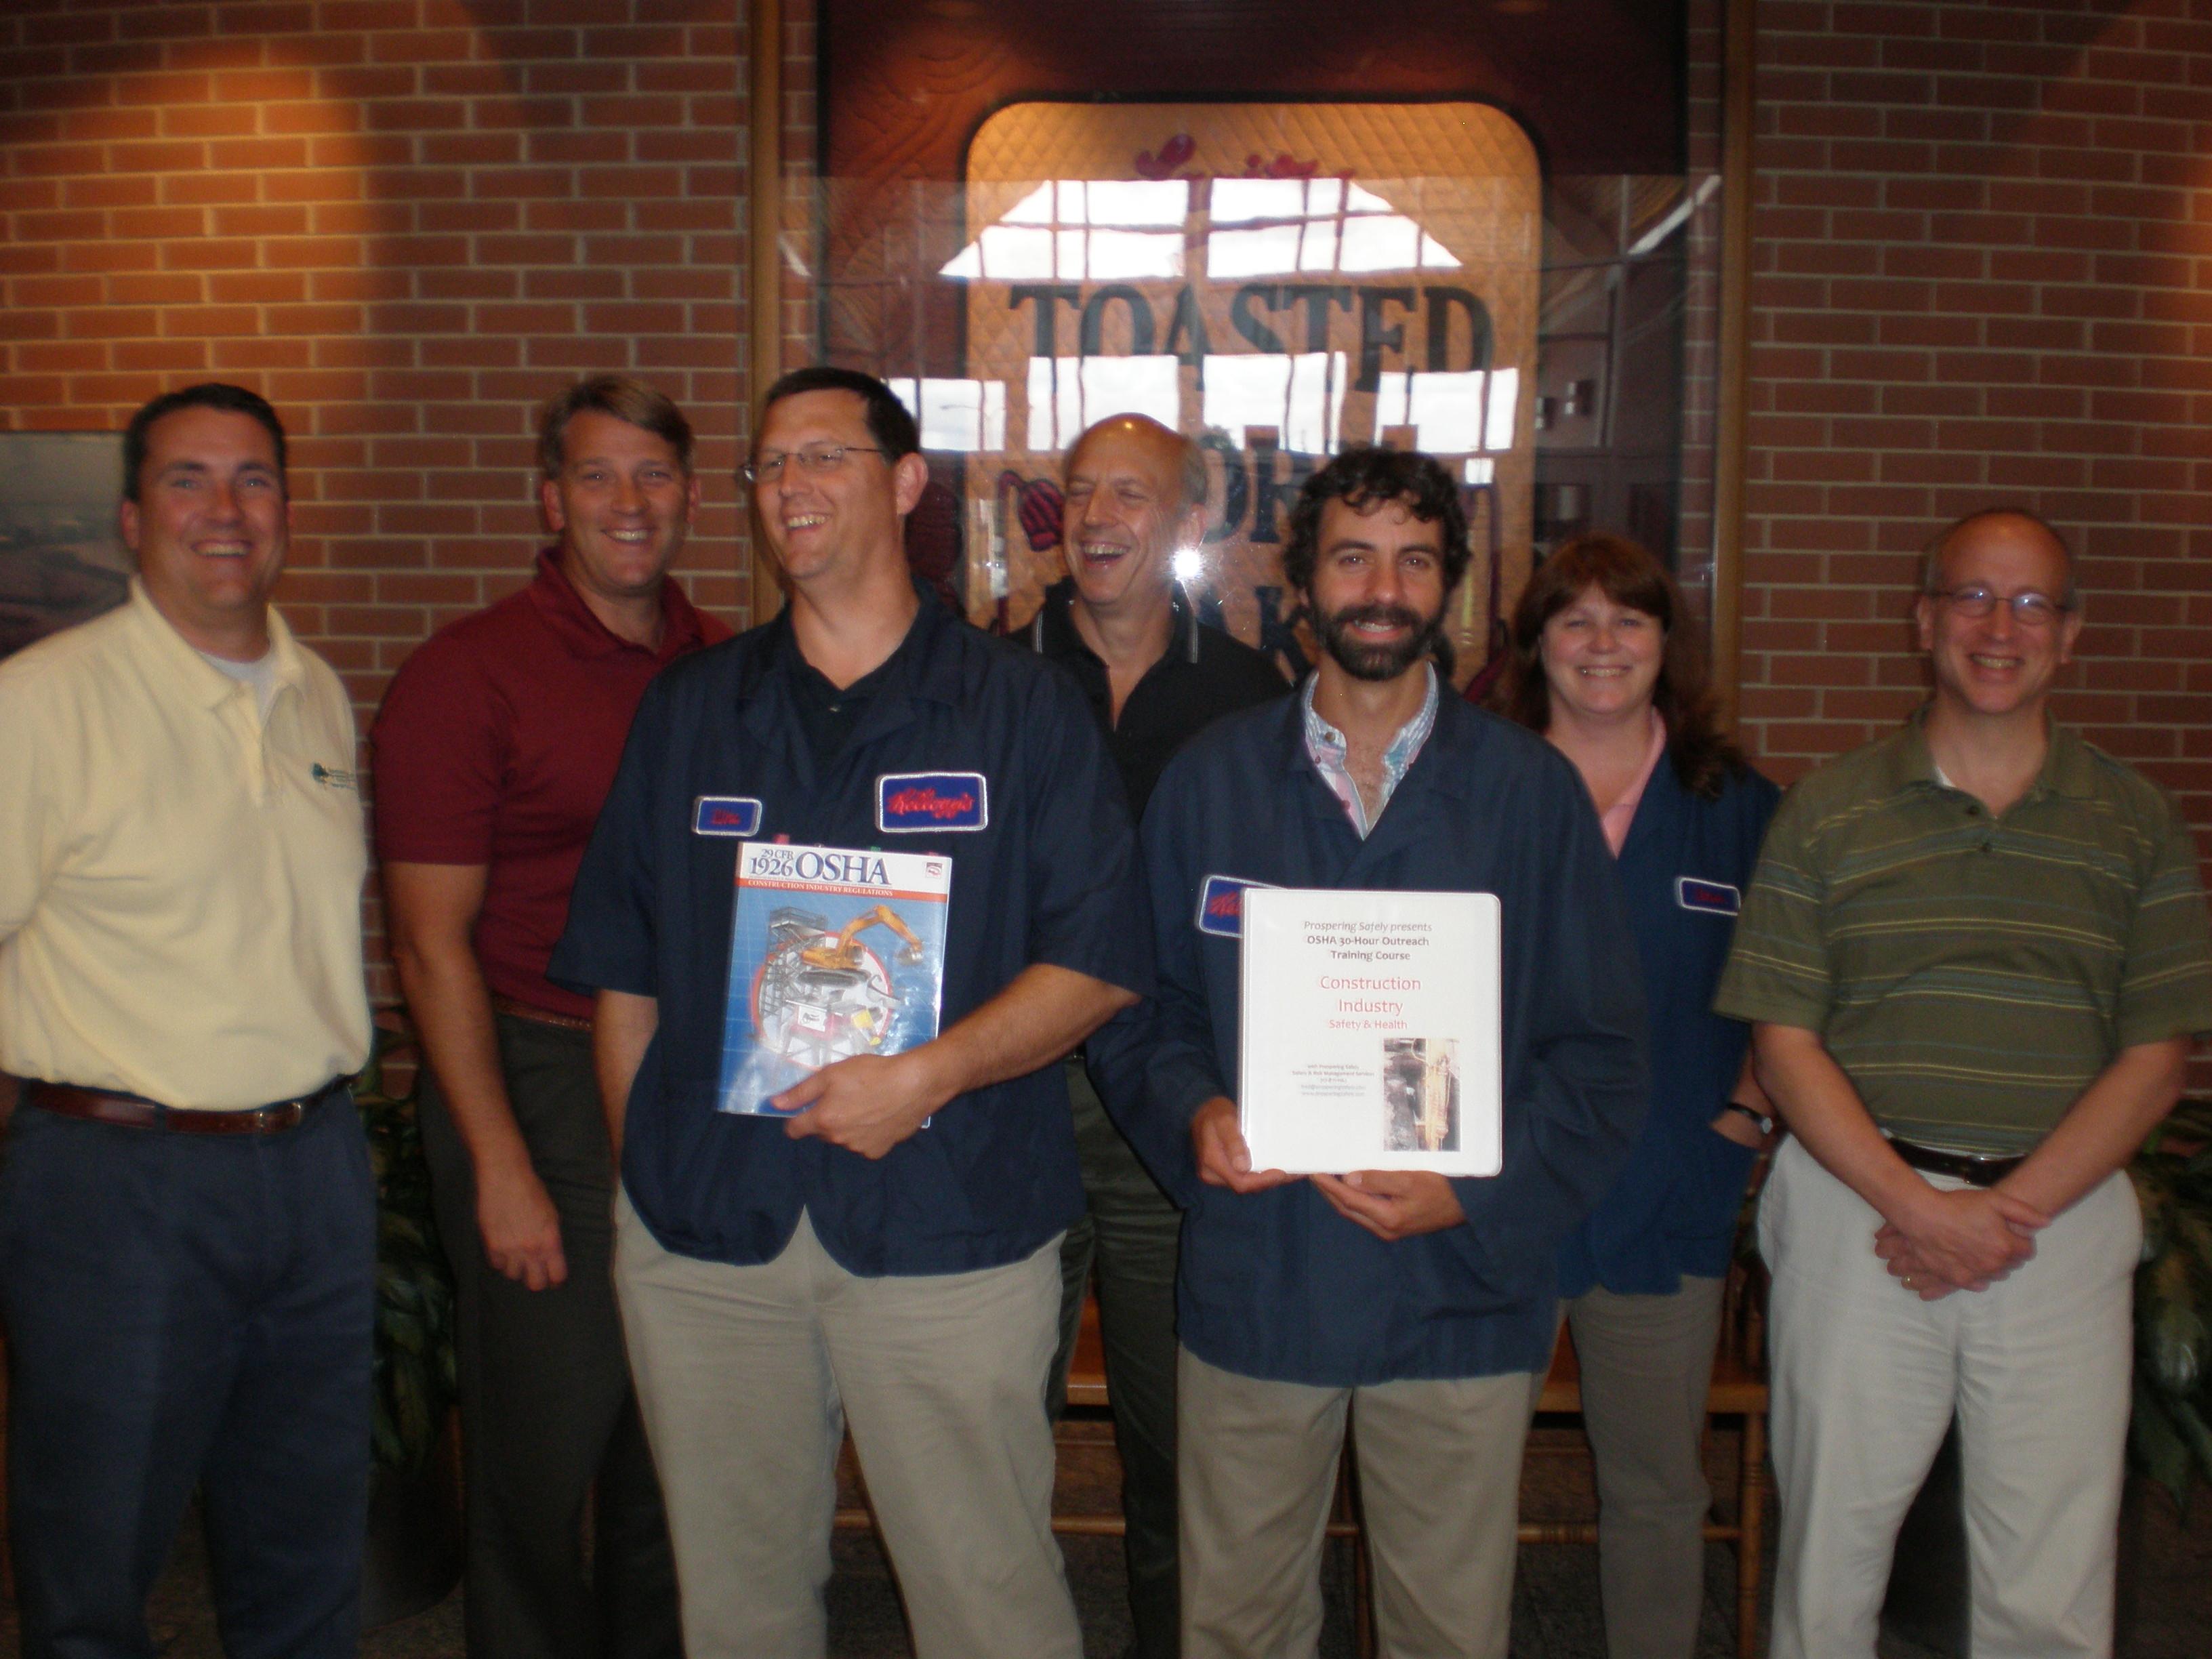 7/09 OSHA 30-Const @ Kellogg in Lancaster, PA